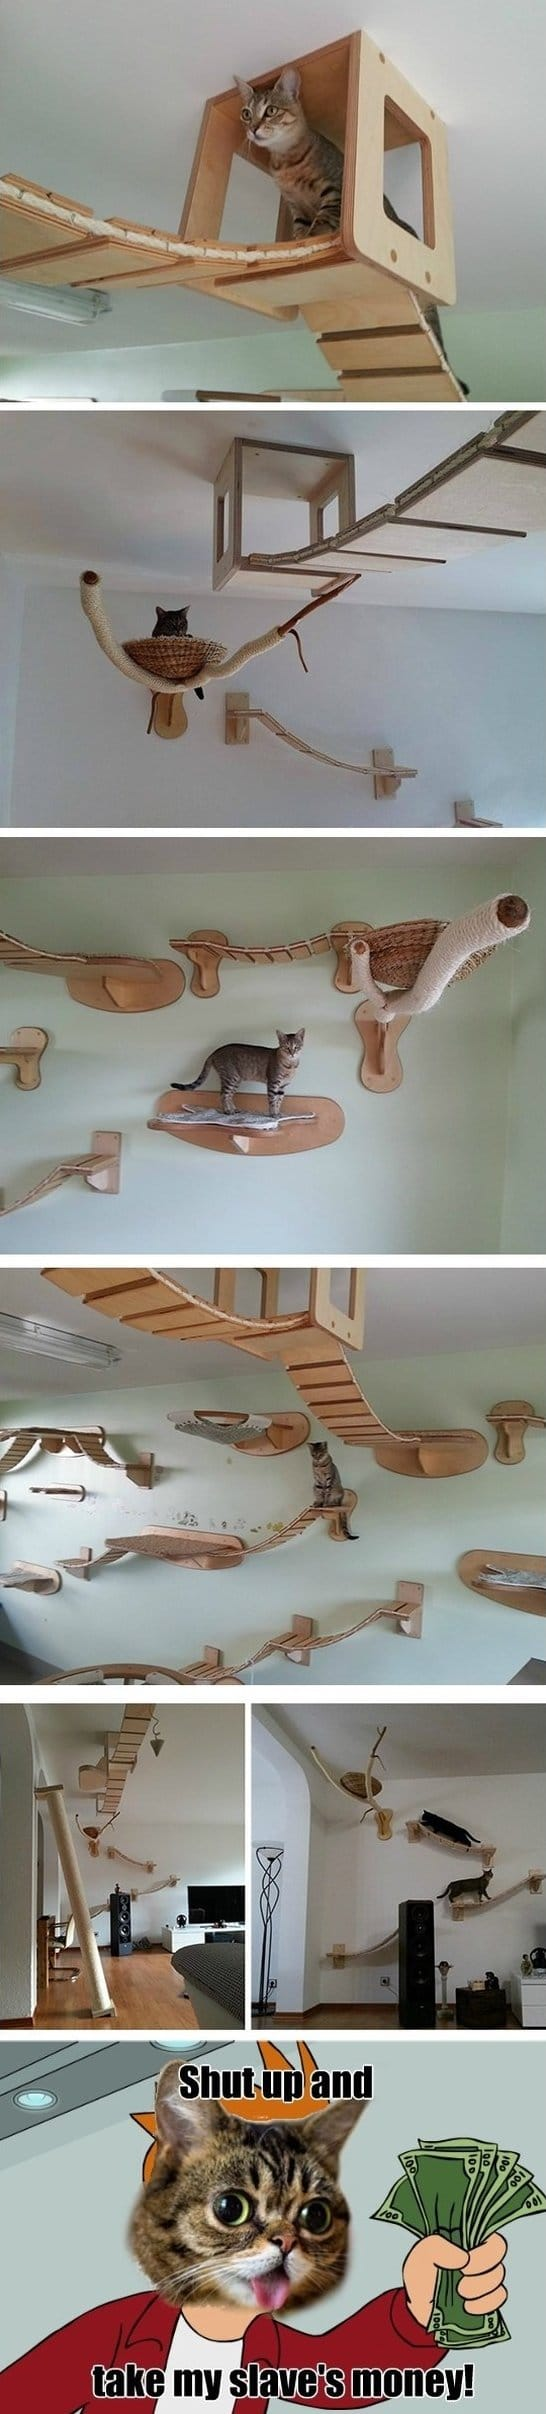 funny cat furniture meme